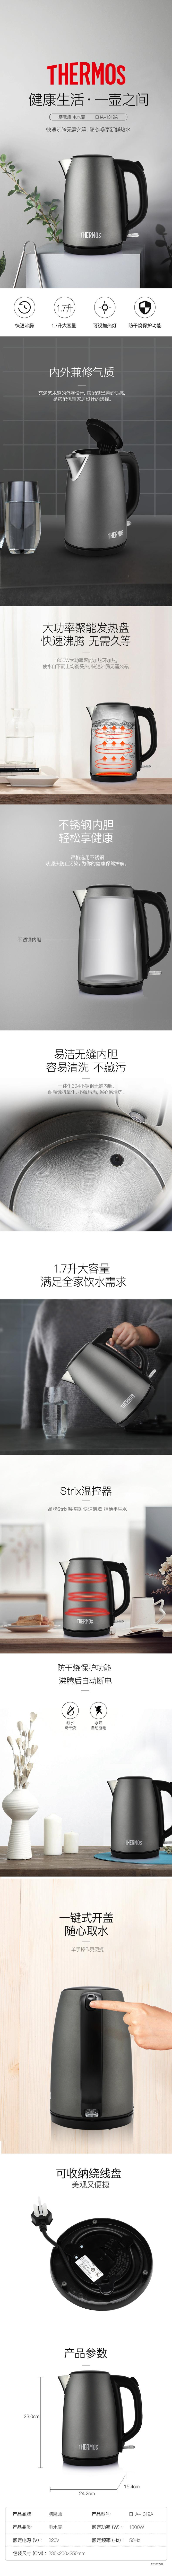 18-12 EHA-1319A 电水壶-审核OK790.jpg